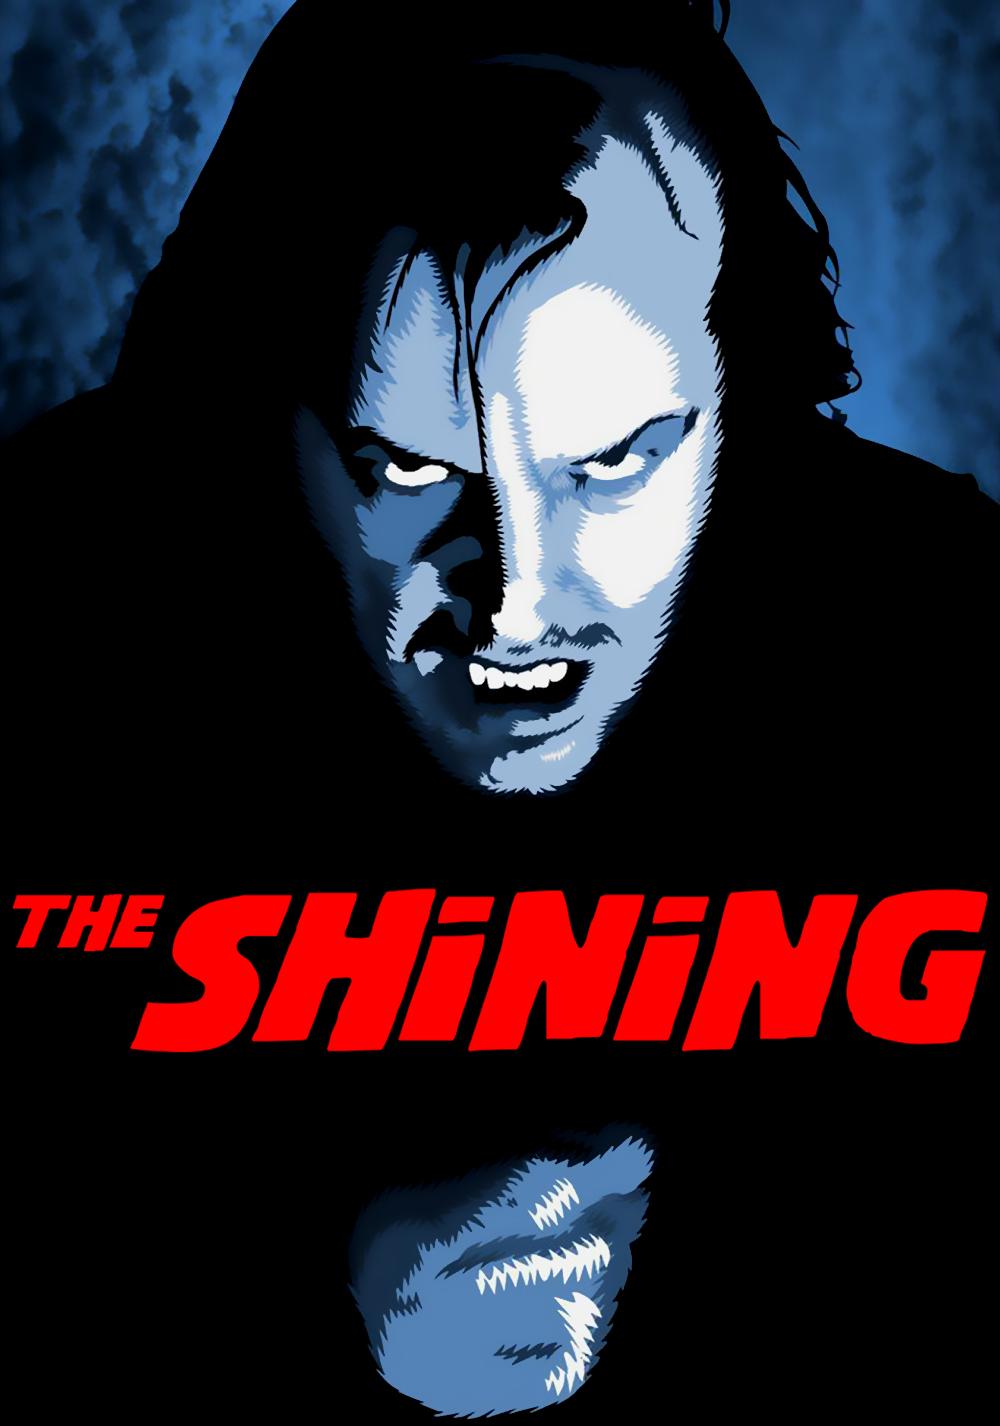 The Shining | Movie fanart | fanart.tv